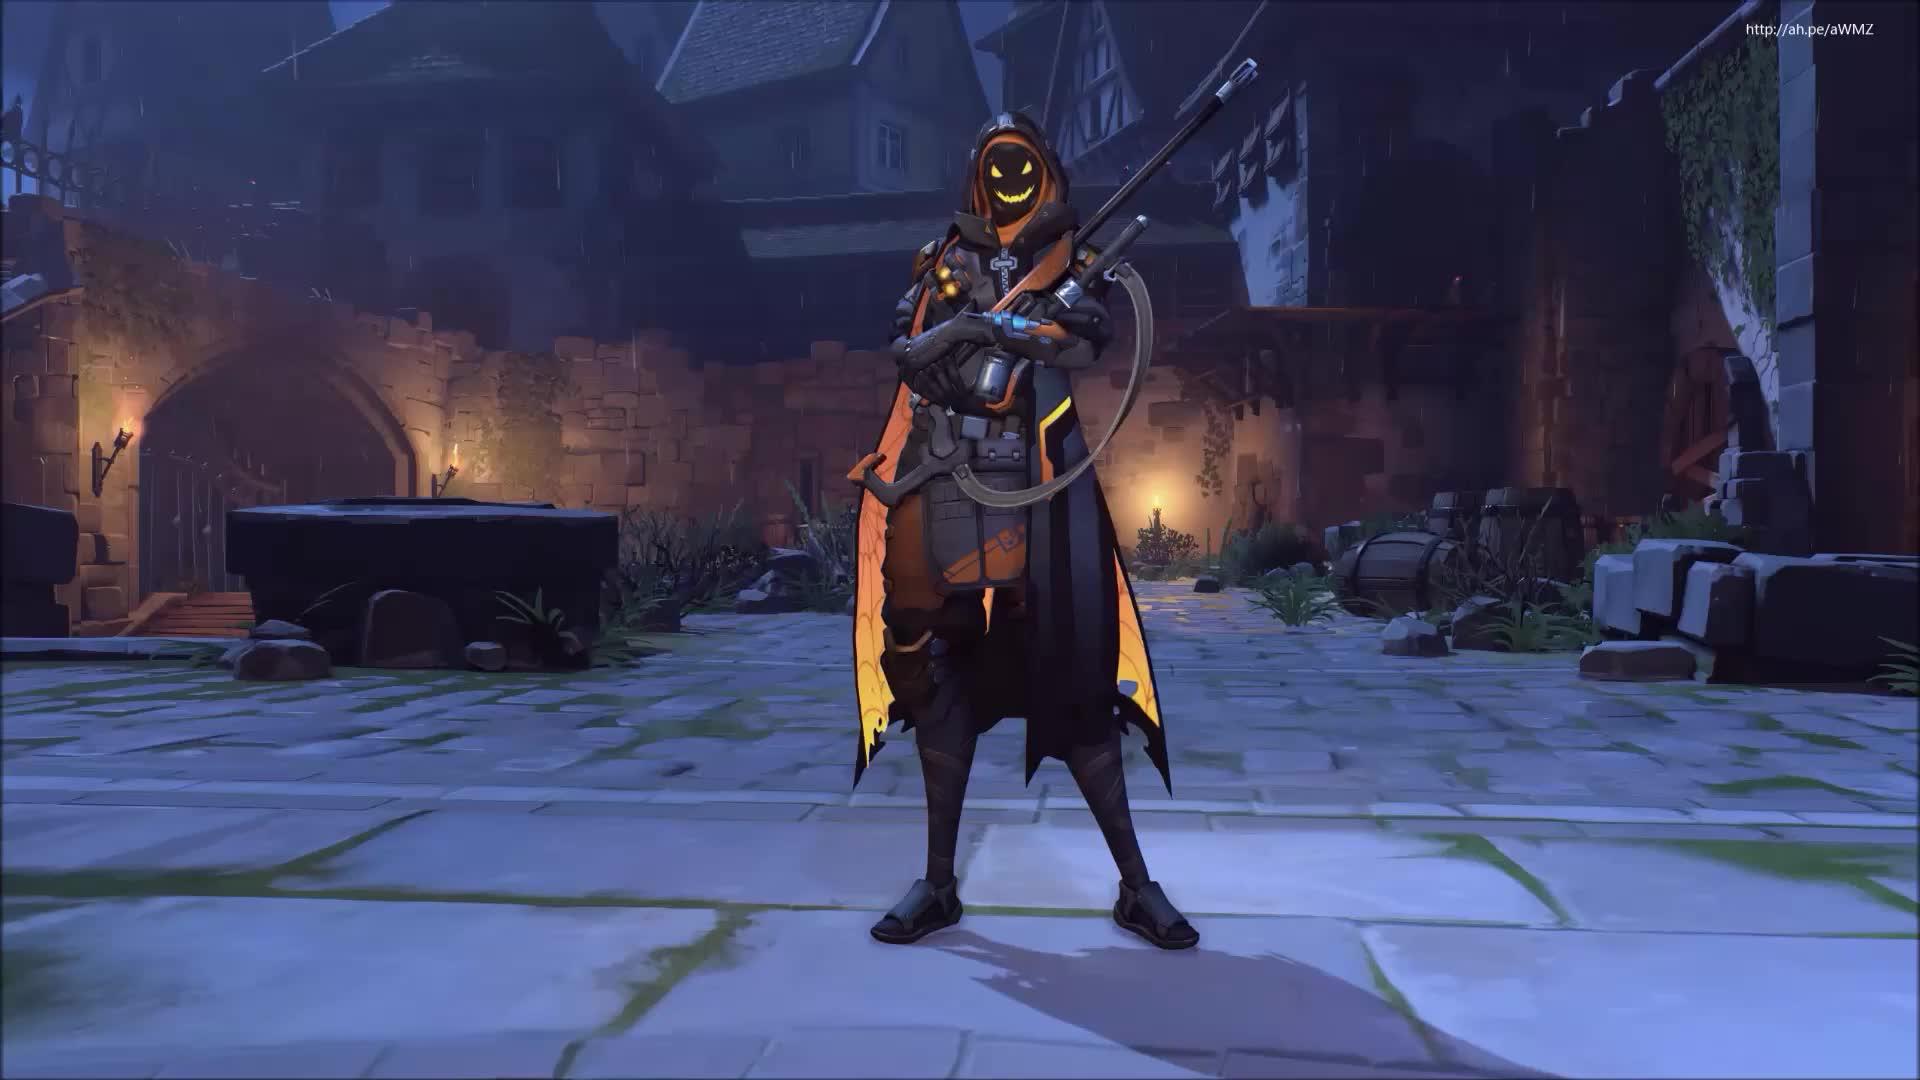 Ana скин на Хеллоуин - живые обои